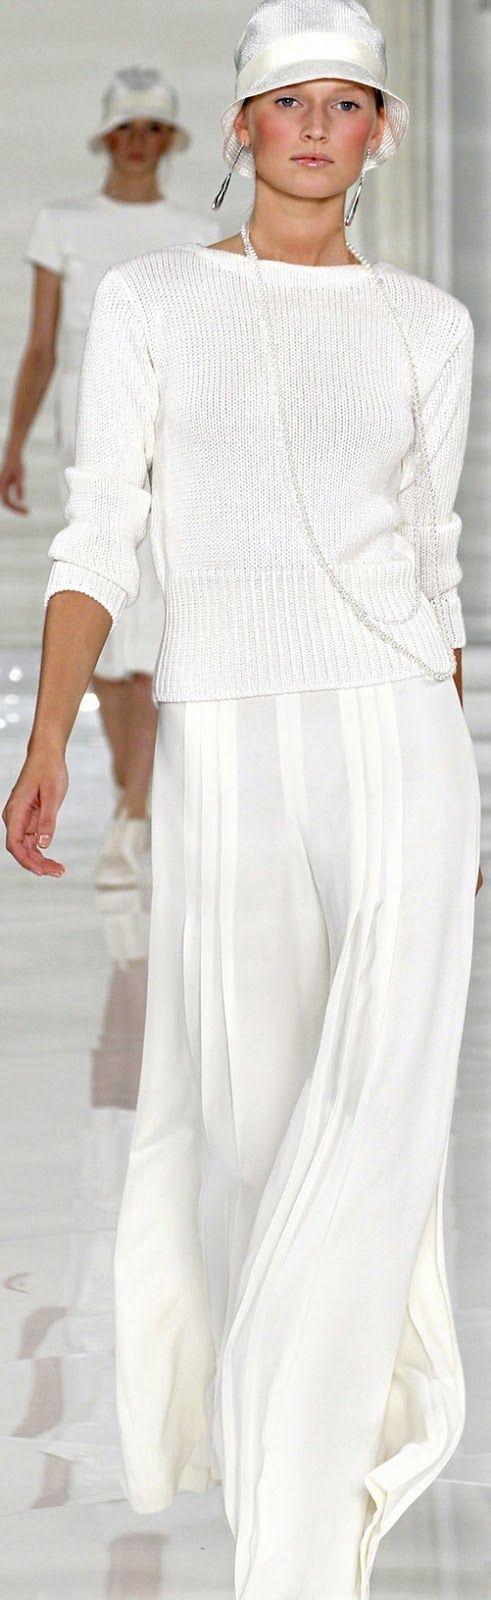 CASHMERE LOVER: WHITE SIMPLICITY...Ralph Lauren